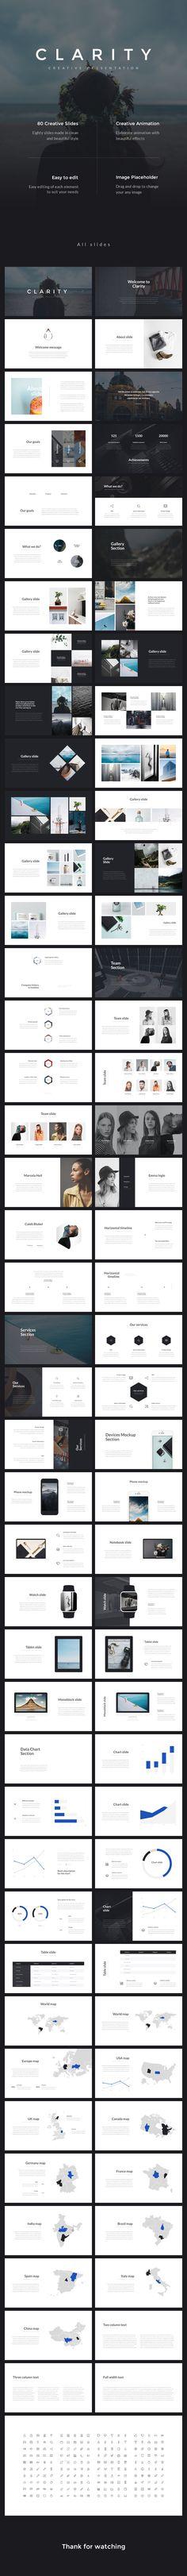 Clarity Keynote Presentation — Keynote KEY #slide #mockup • Available here → https://graphicriver.net/item/clarity-keynote-presentation/17563031?ref=pxcr